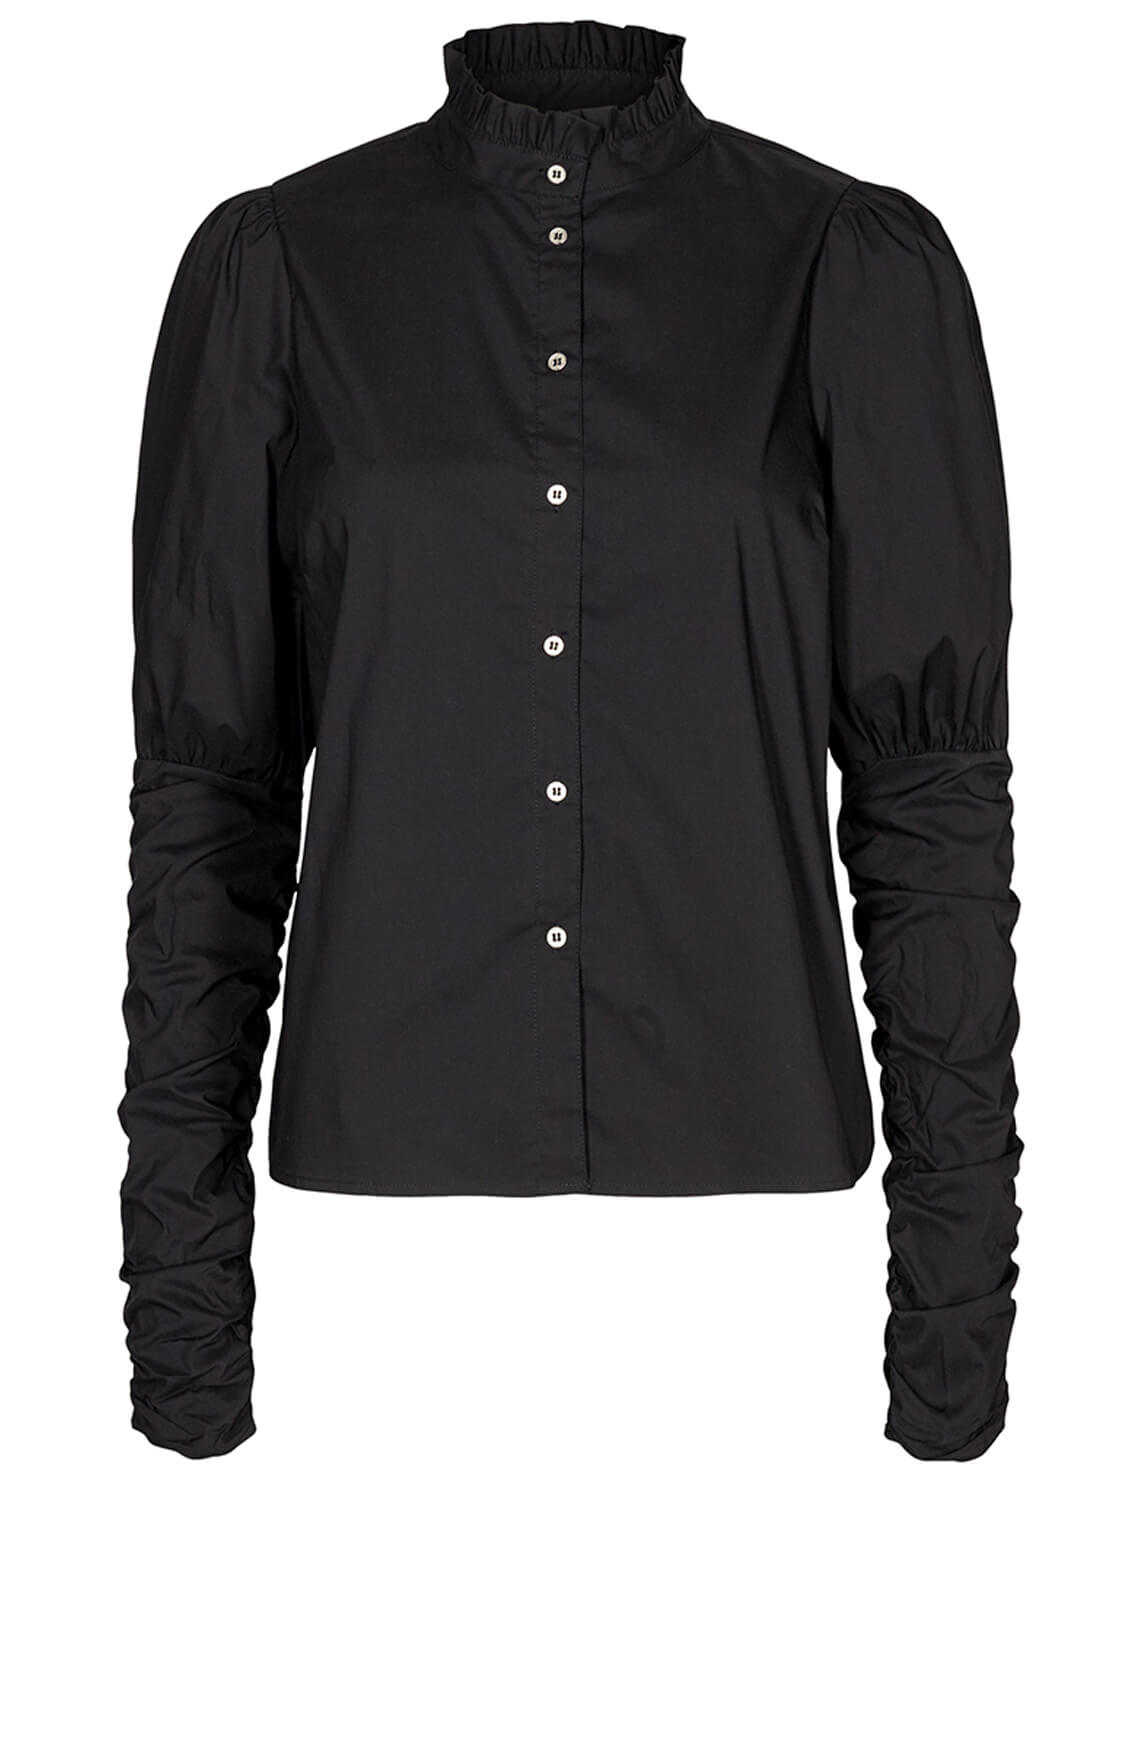 Co Couture Dames Sandy blouse zwart